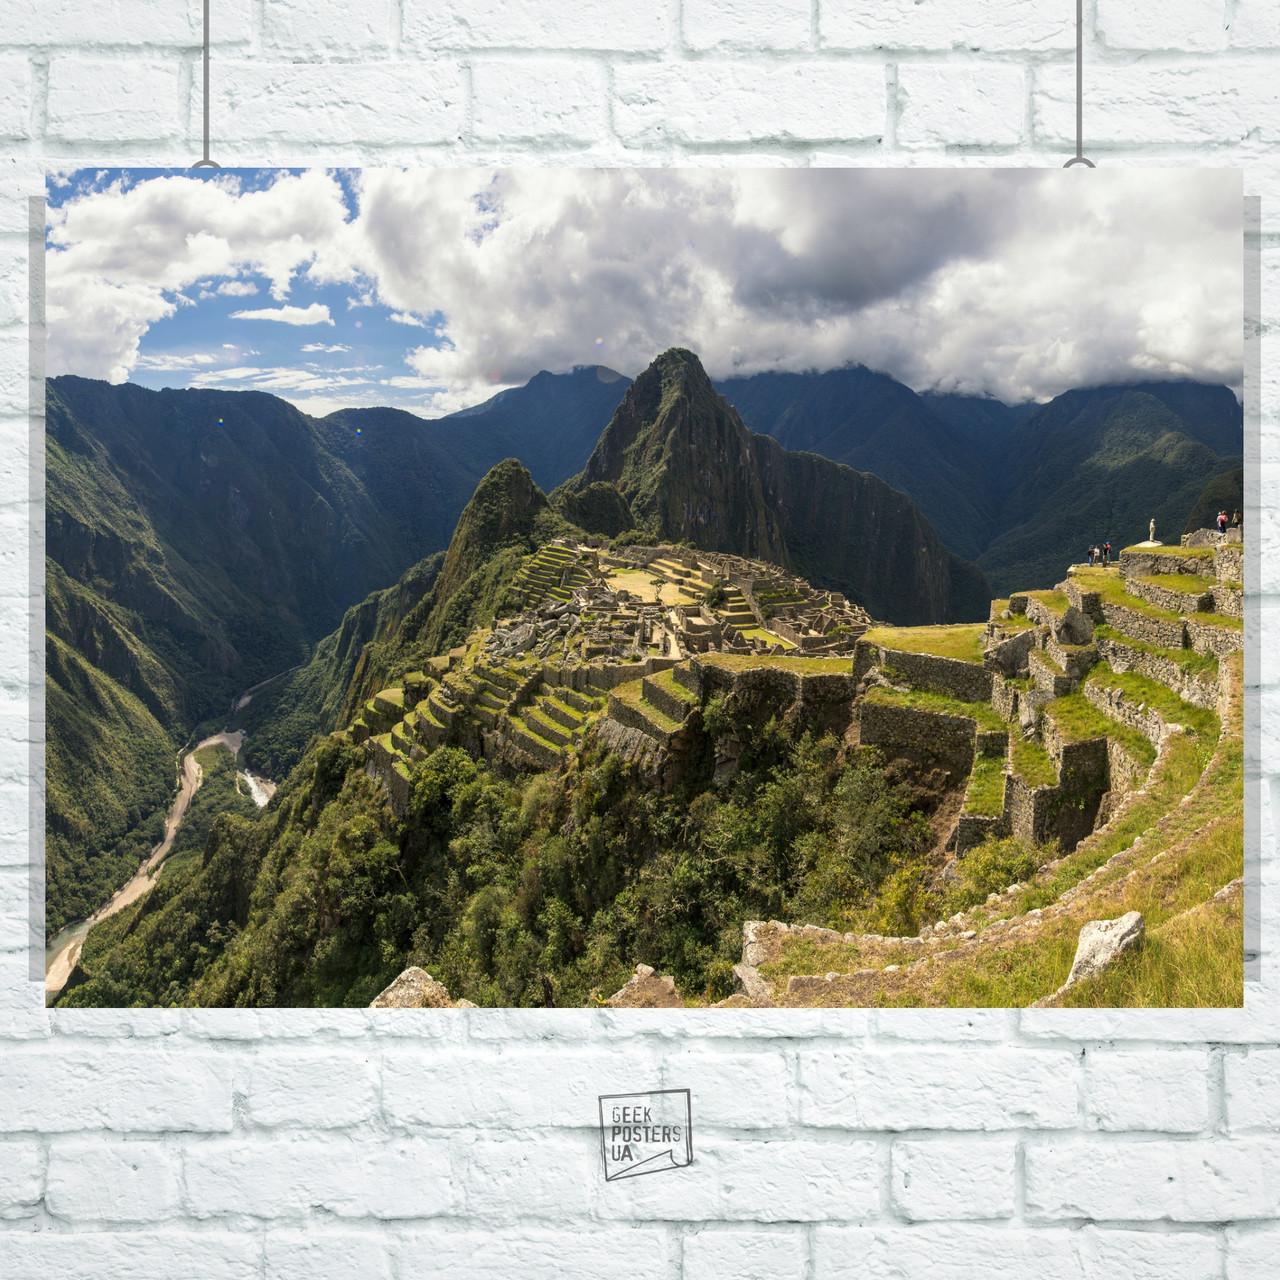 Постер Мачу-Пикчу, Перу. Machu Picchu. Размер 60x42см (A2). Глянцевая бумага